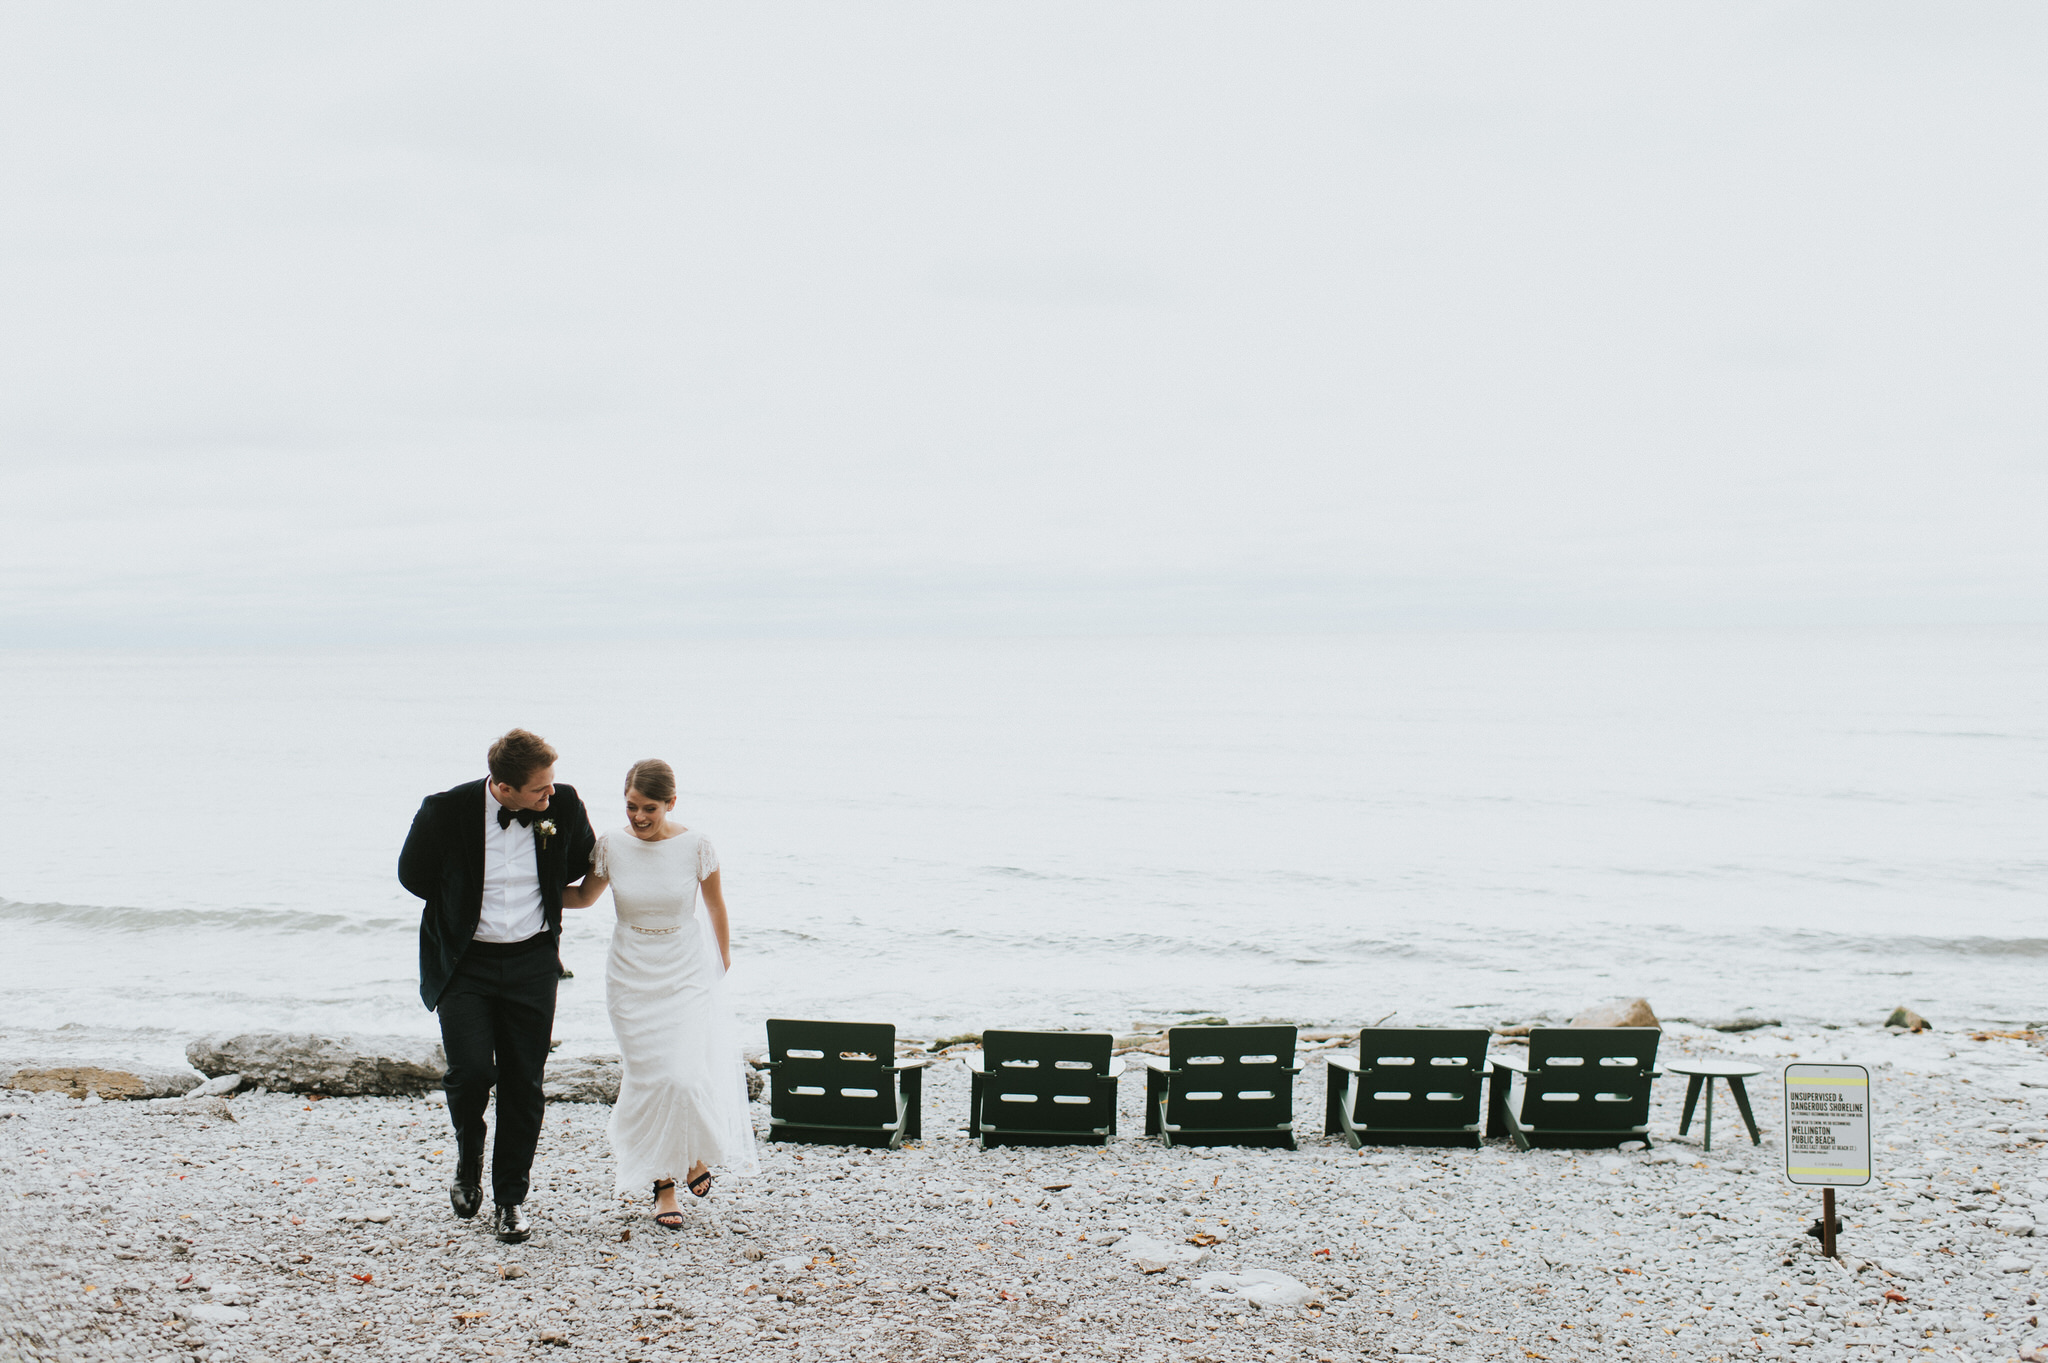 scarletoneillphotography_weddingphotography_prince edward county weddings044.JPG